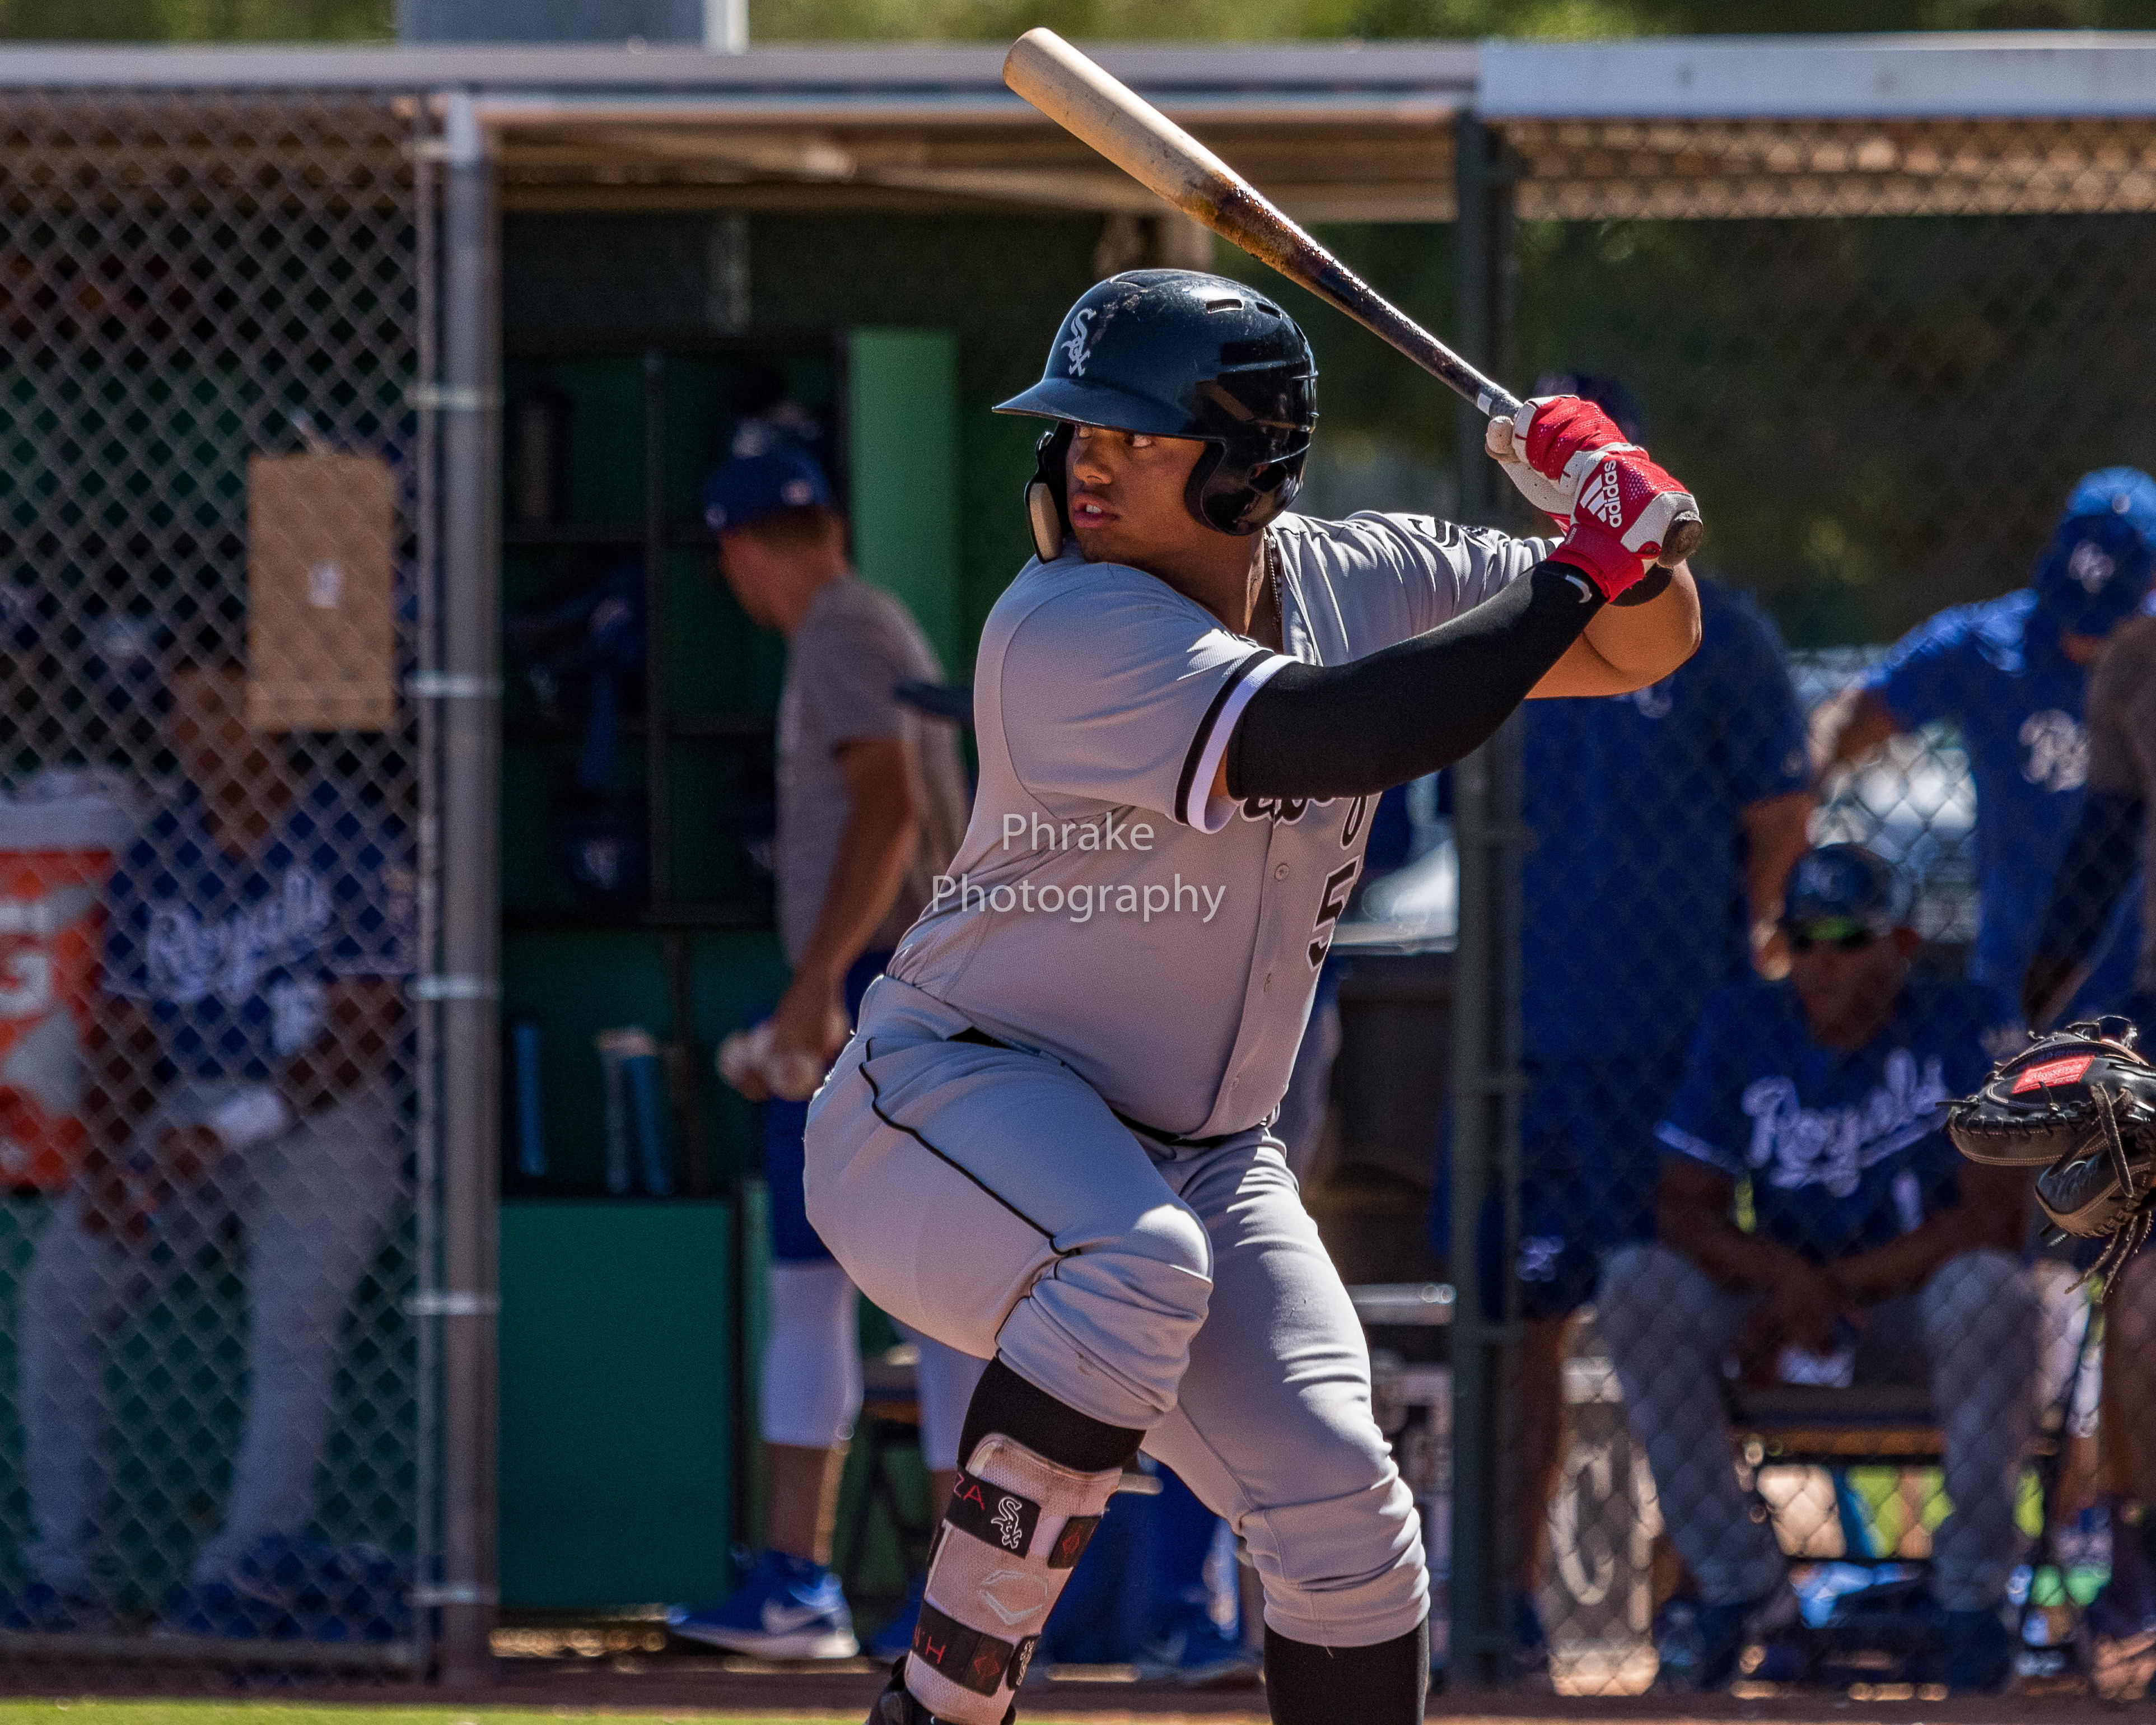 Harvin Mendoza bats lefty, open side with a leg kick